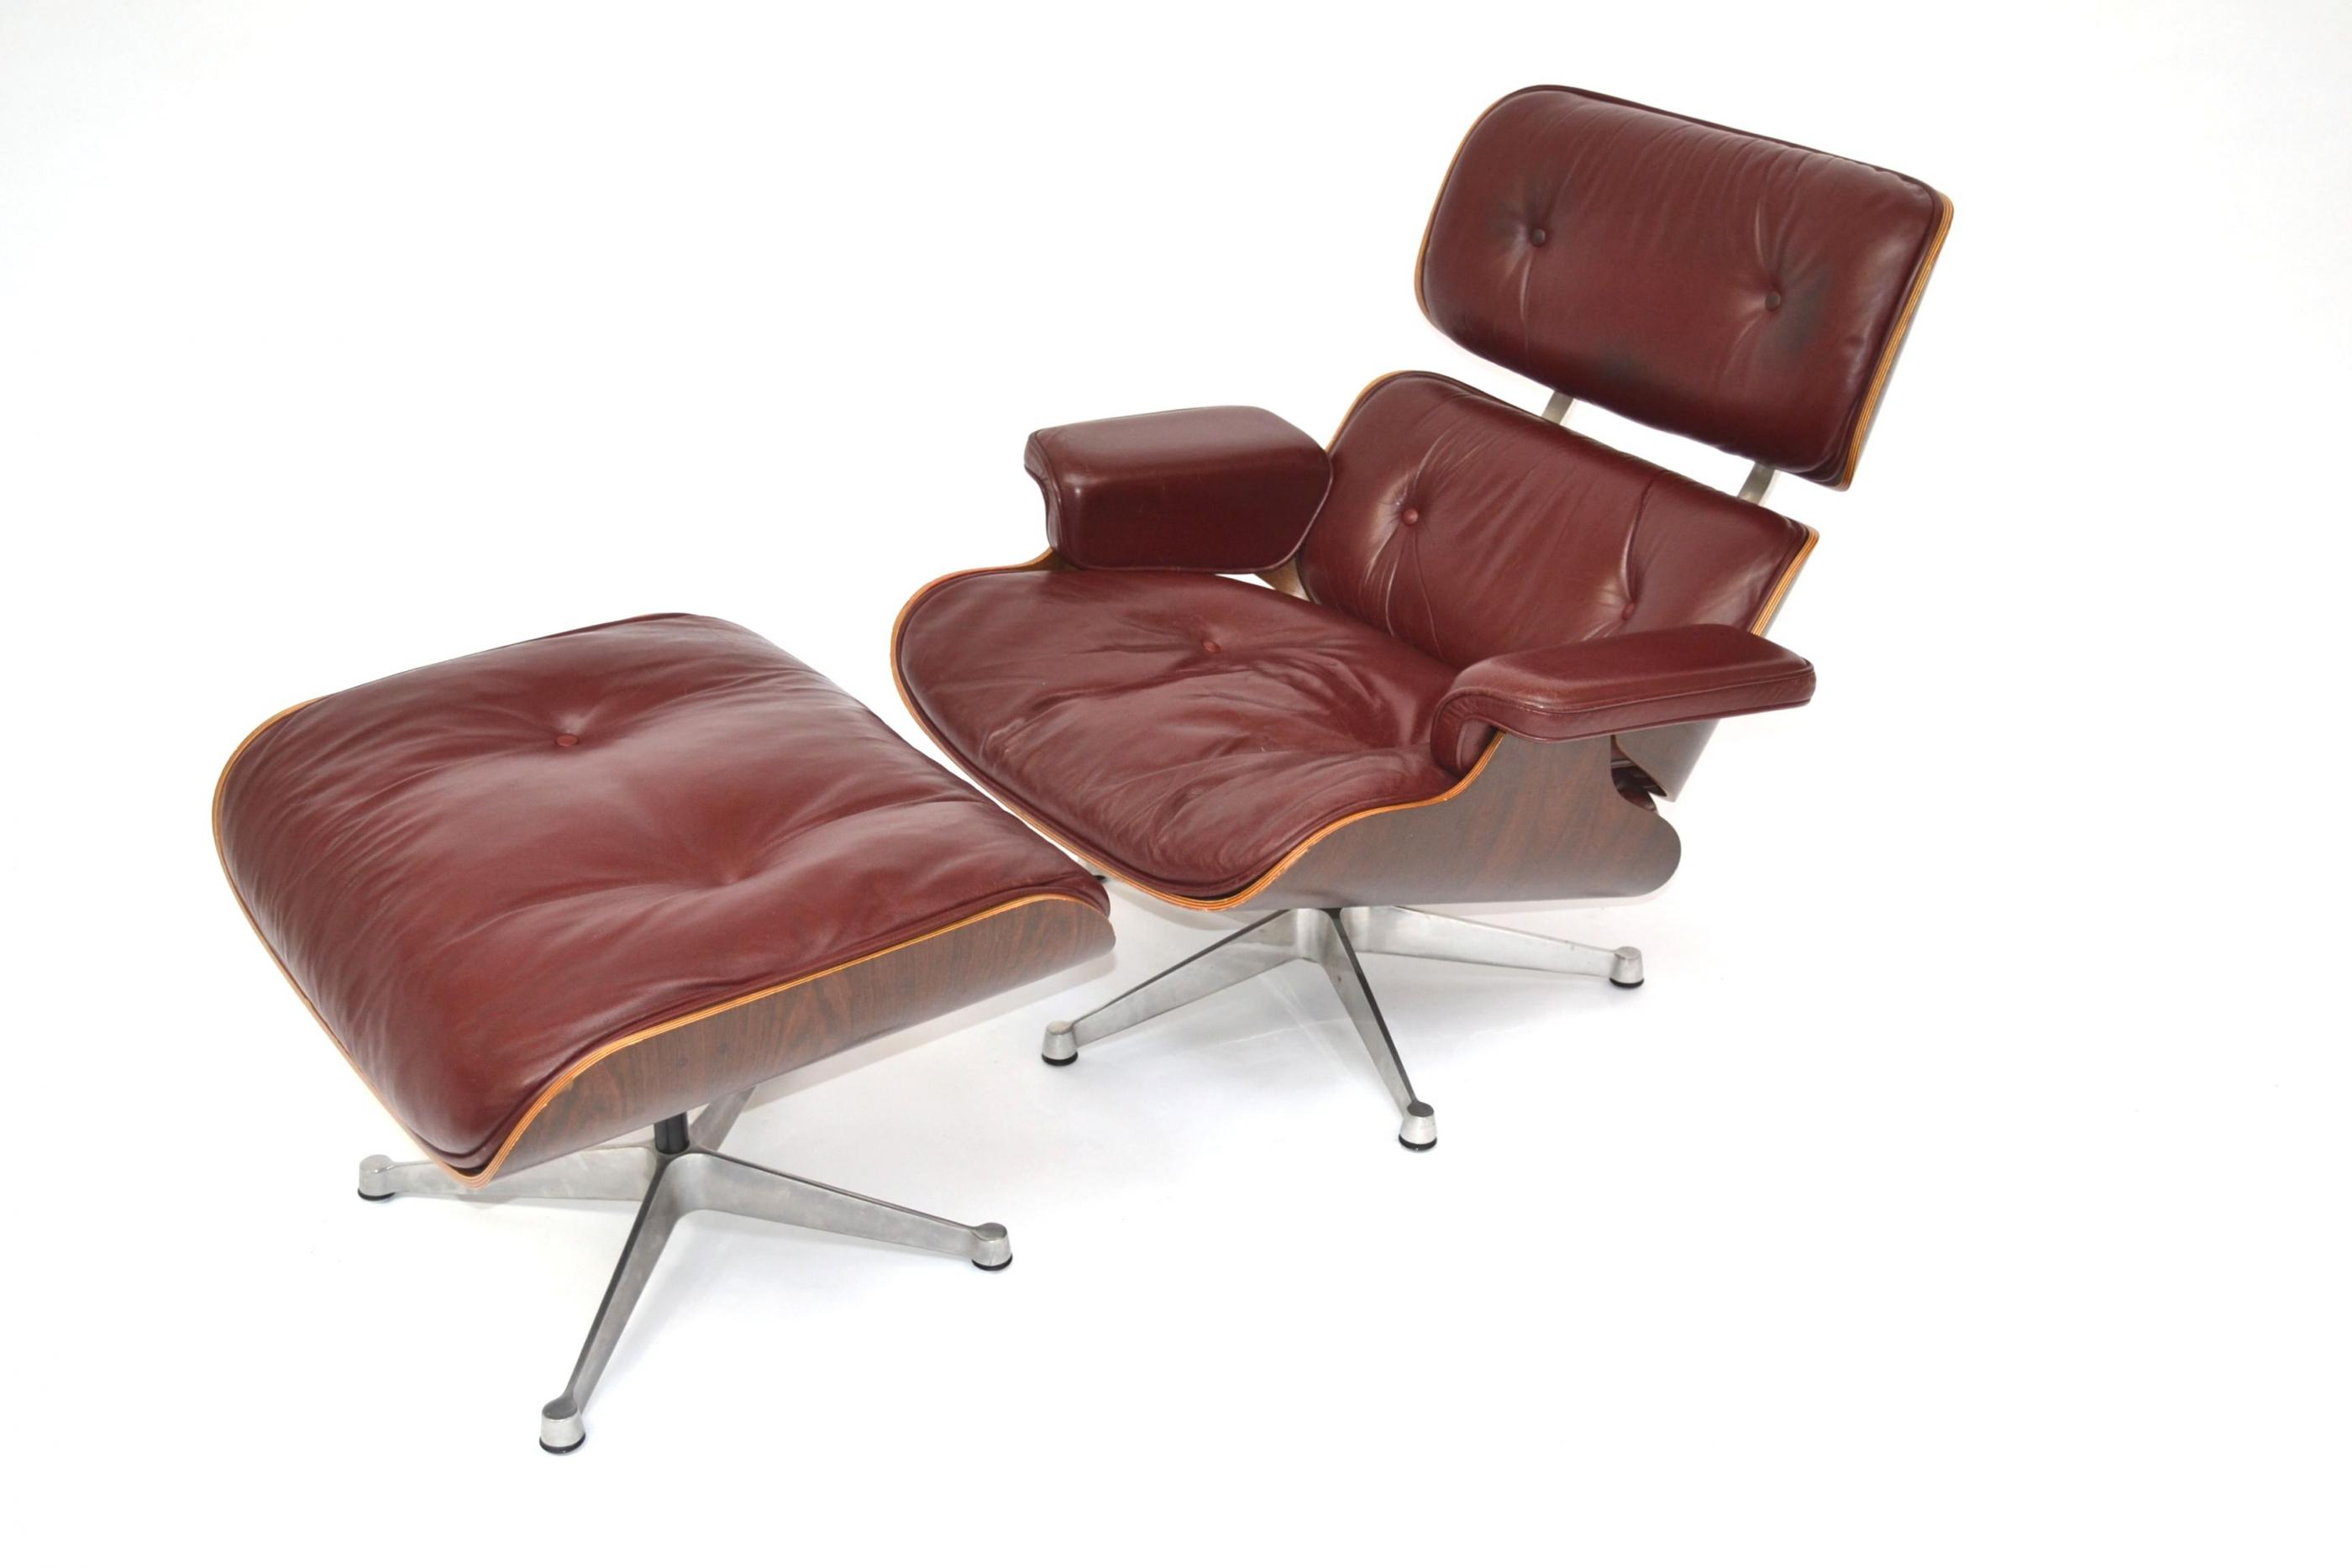 lounge chair charles eames icf modernism. Black Bedroom Furniture Sets. Home Design Ideas